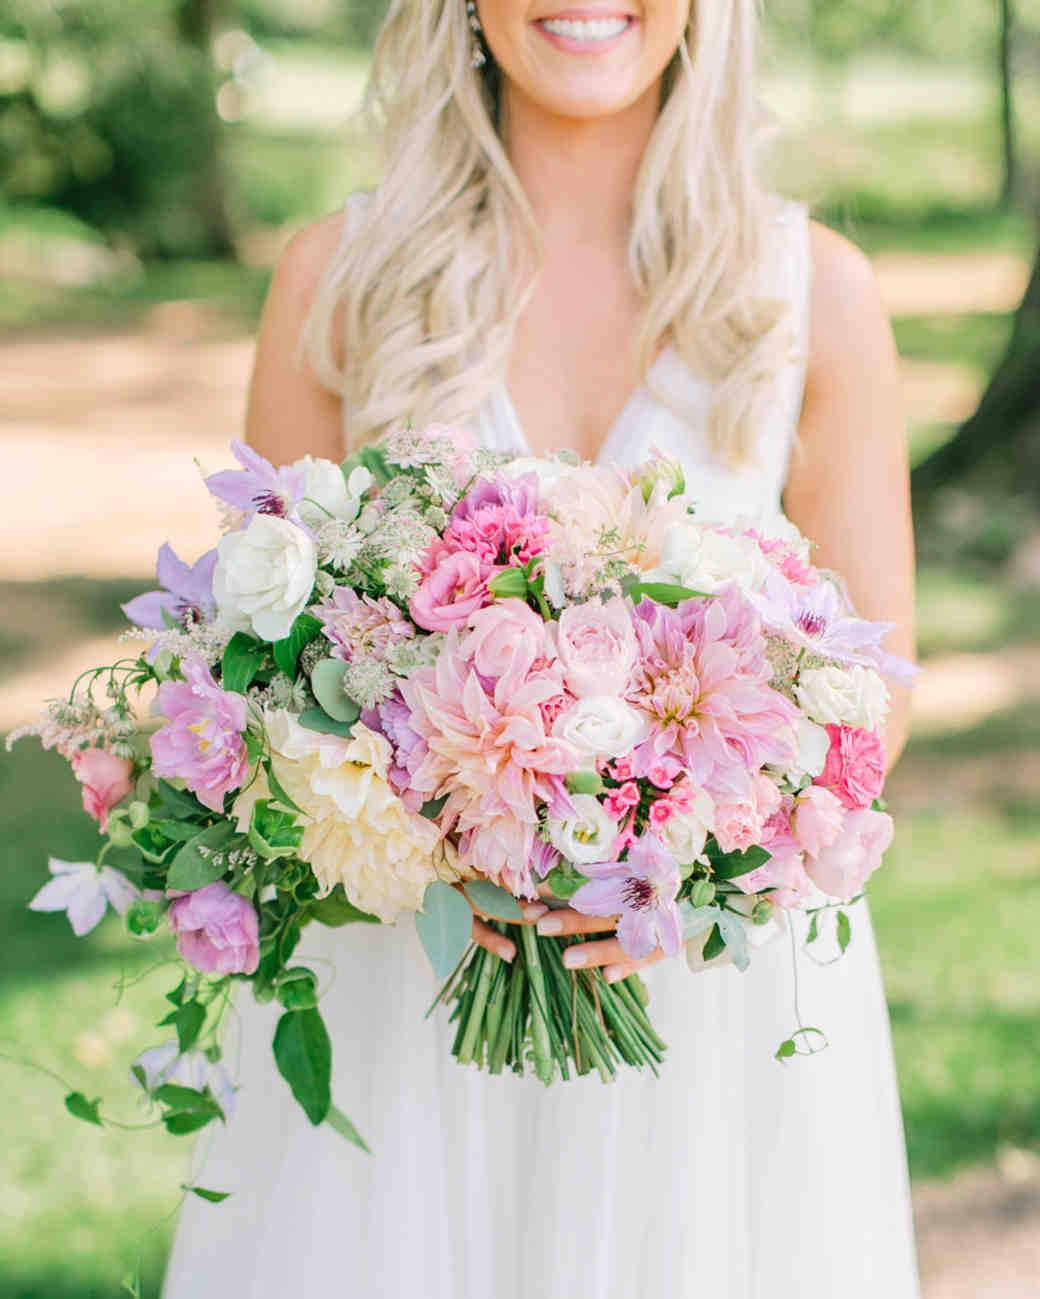 Pale Pink Wedding Flower Bouquets: Light Pink Wedding Flower Bouquets